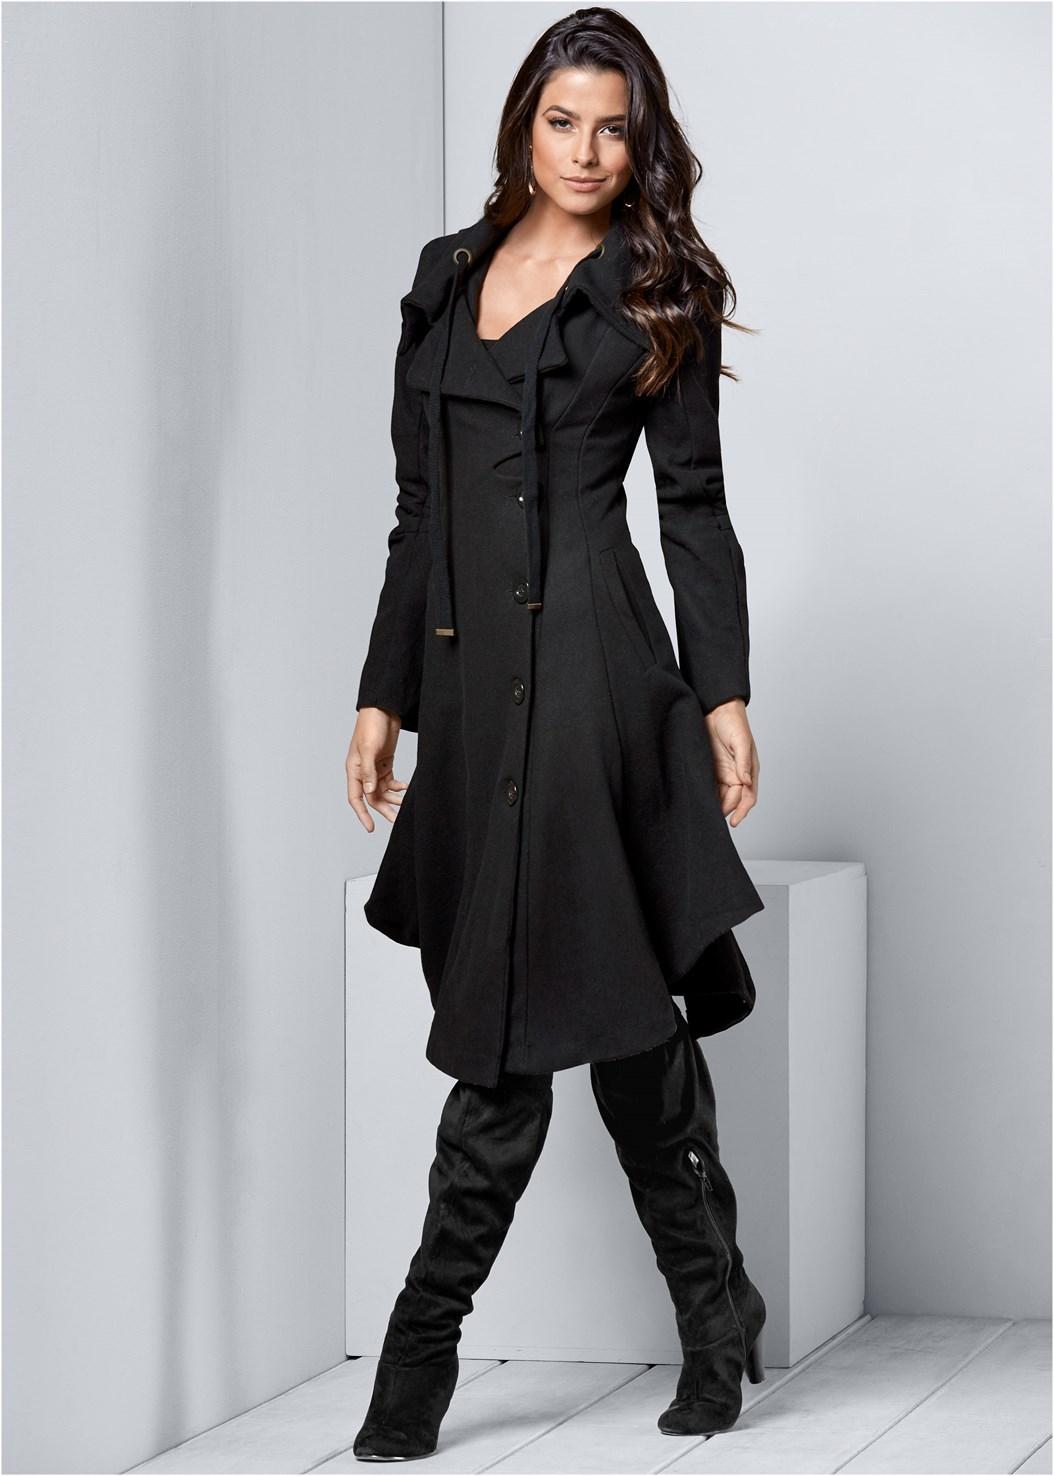 Handkerchief Hem Coat,Seamless Cami,Basic Leggings,Fold Over Boot,Print Detail Handbag